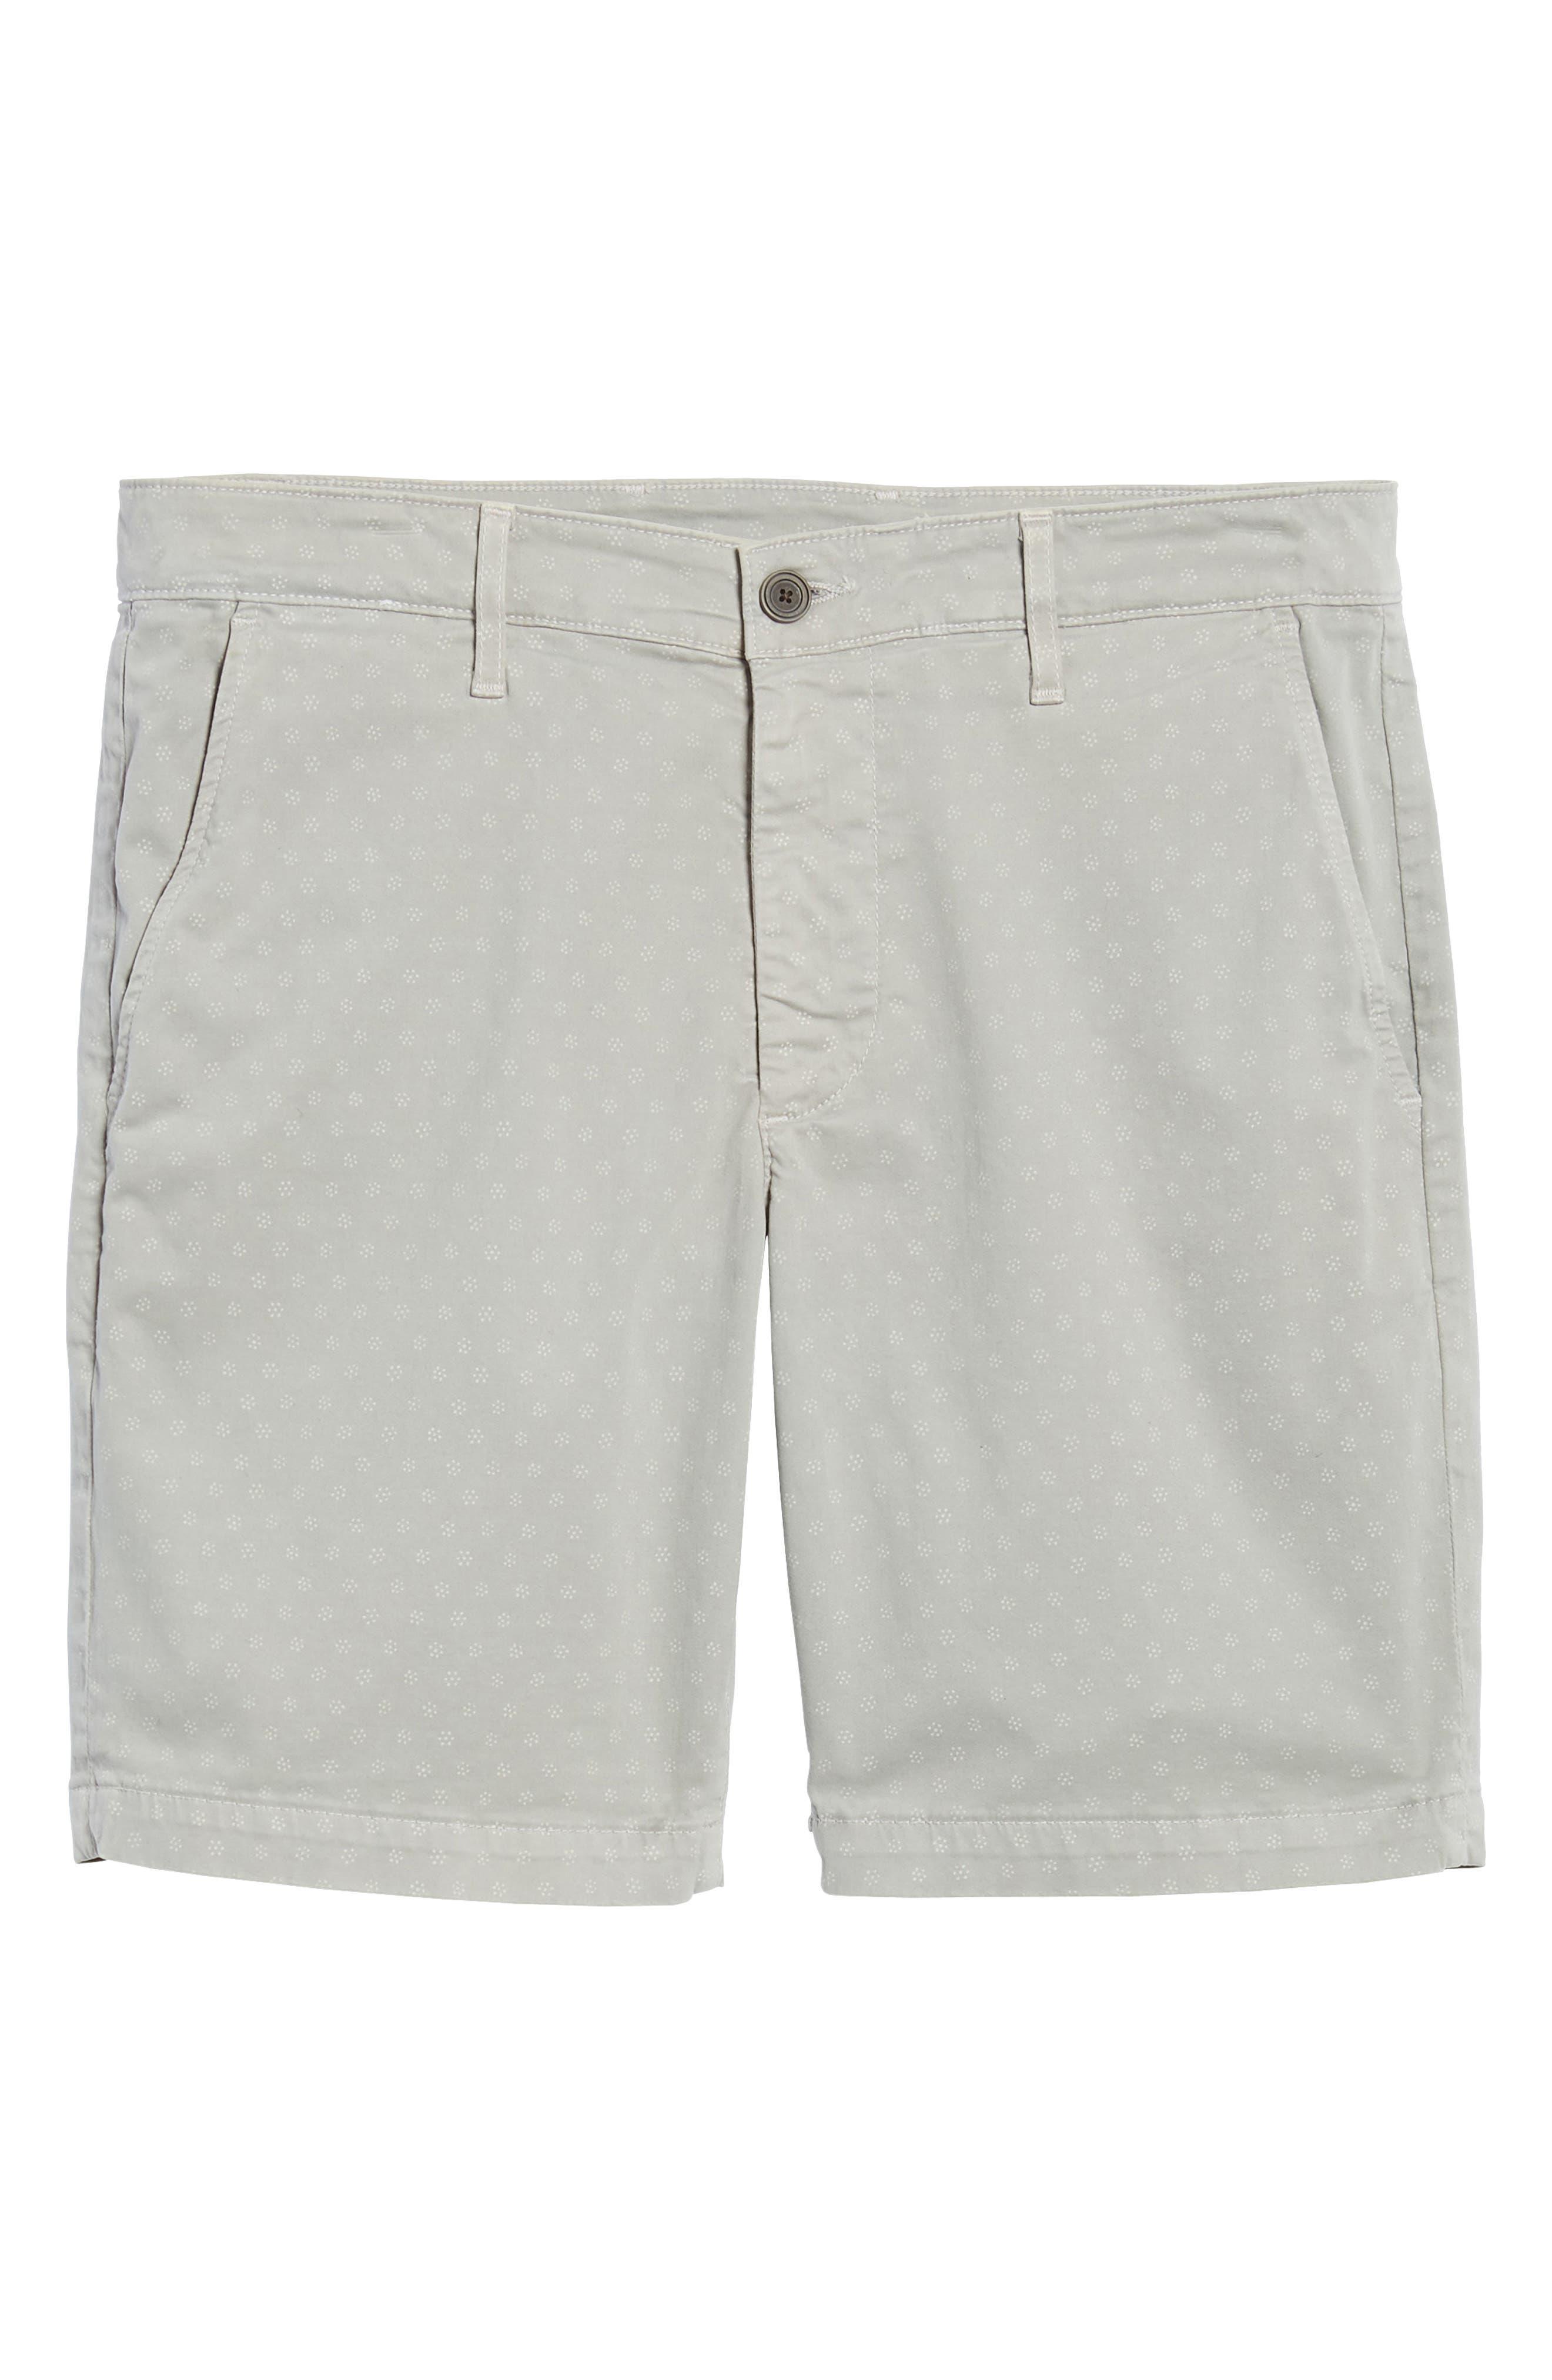 Flora Print Slim Fit Shorts,                             Alternate thumbnail 6, color,                             020